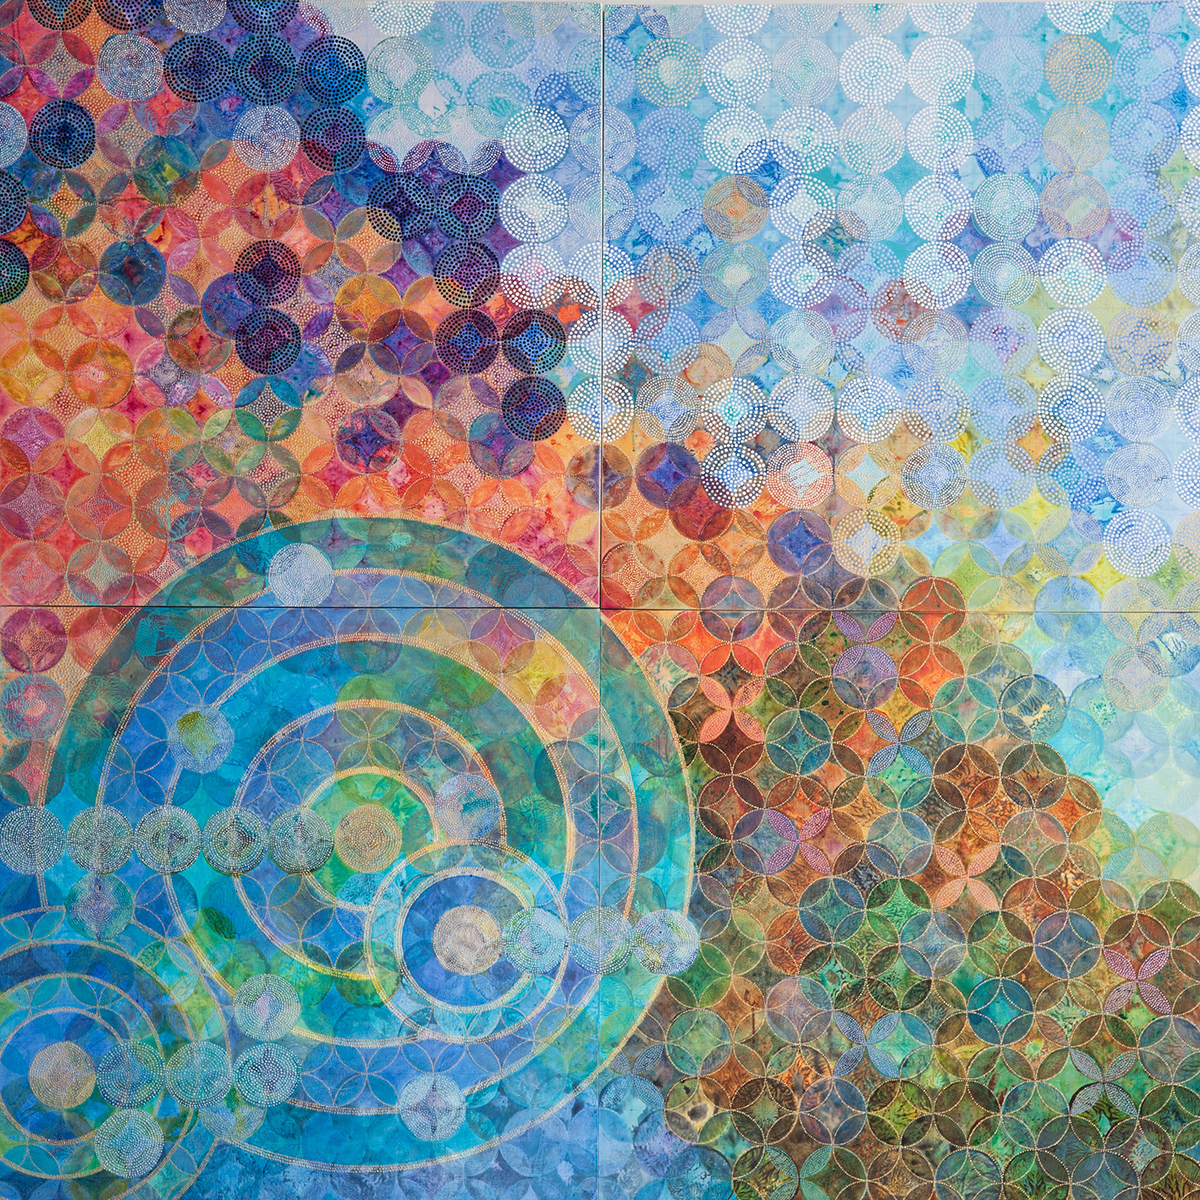 D. Driscoll,  Circles 30 (Elemental,)  acrylic on panel, 72x72